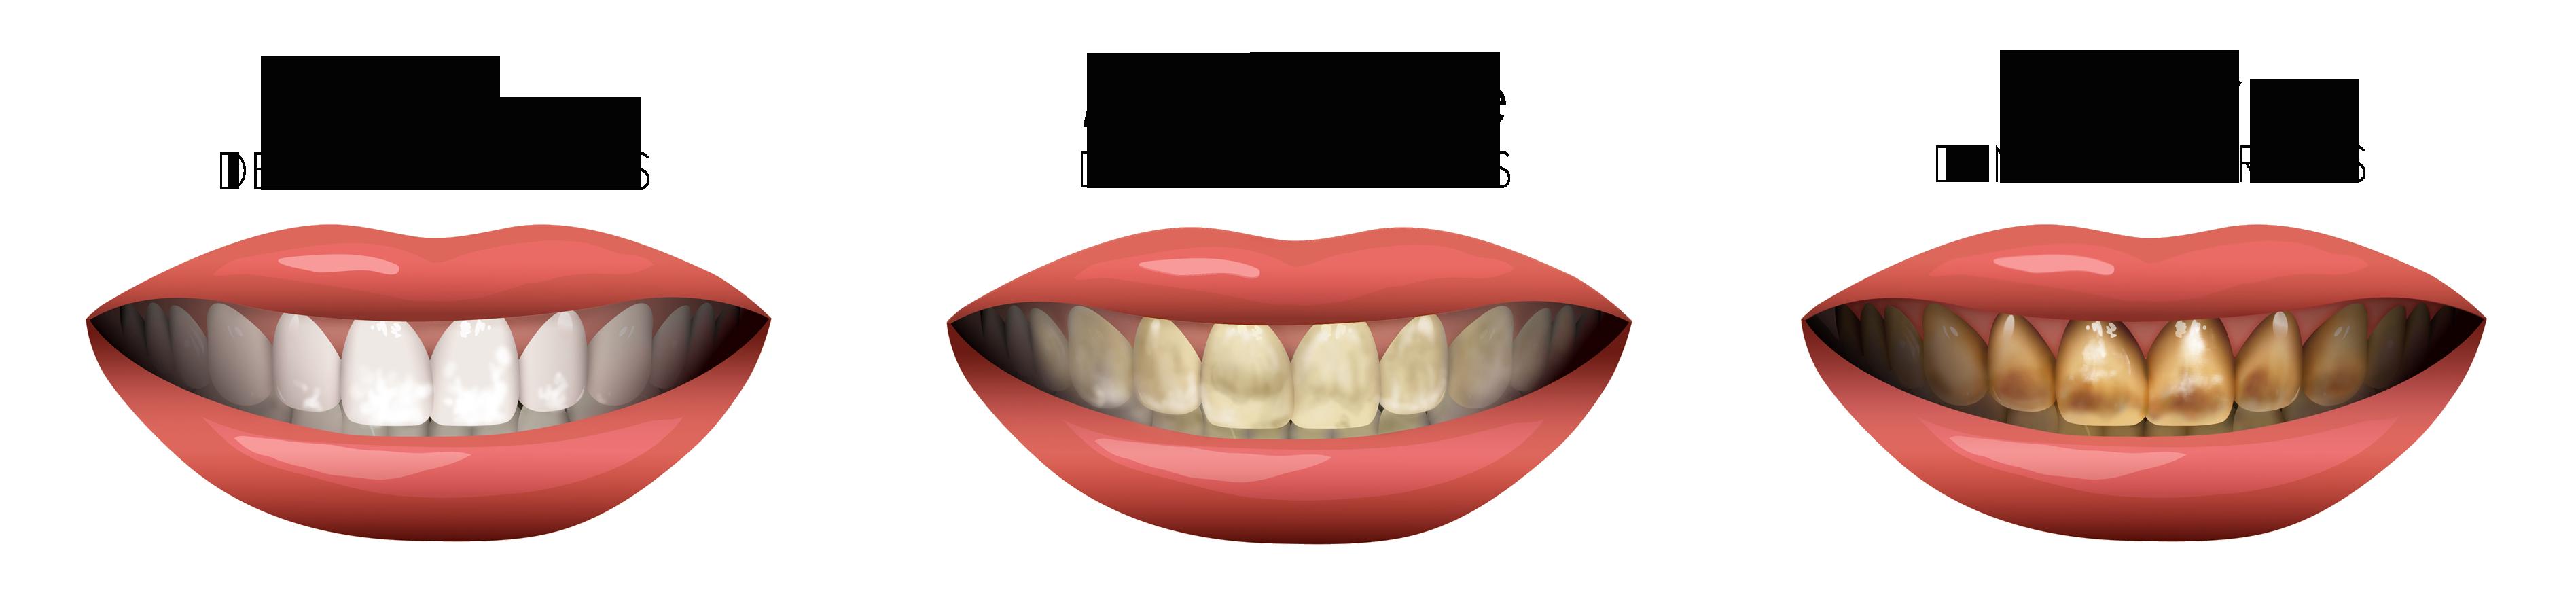 dental fluorosis chart